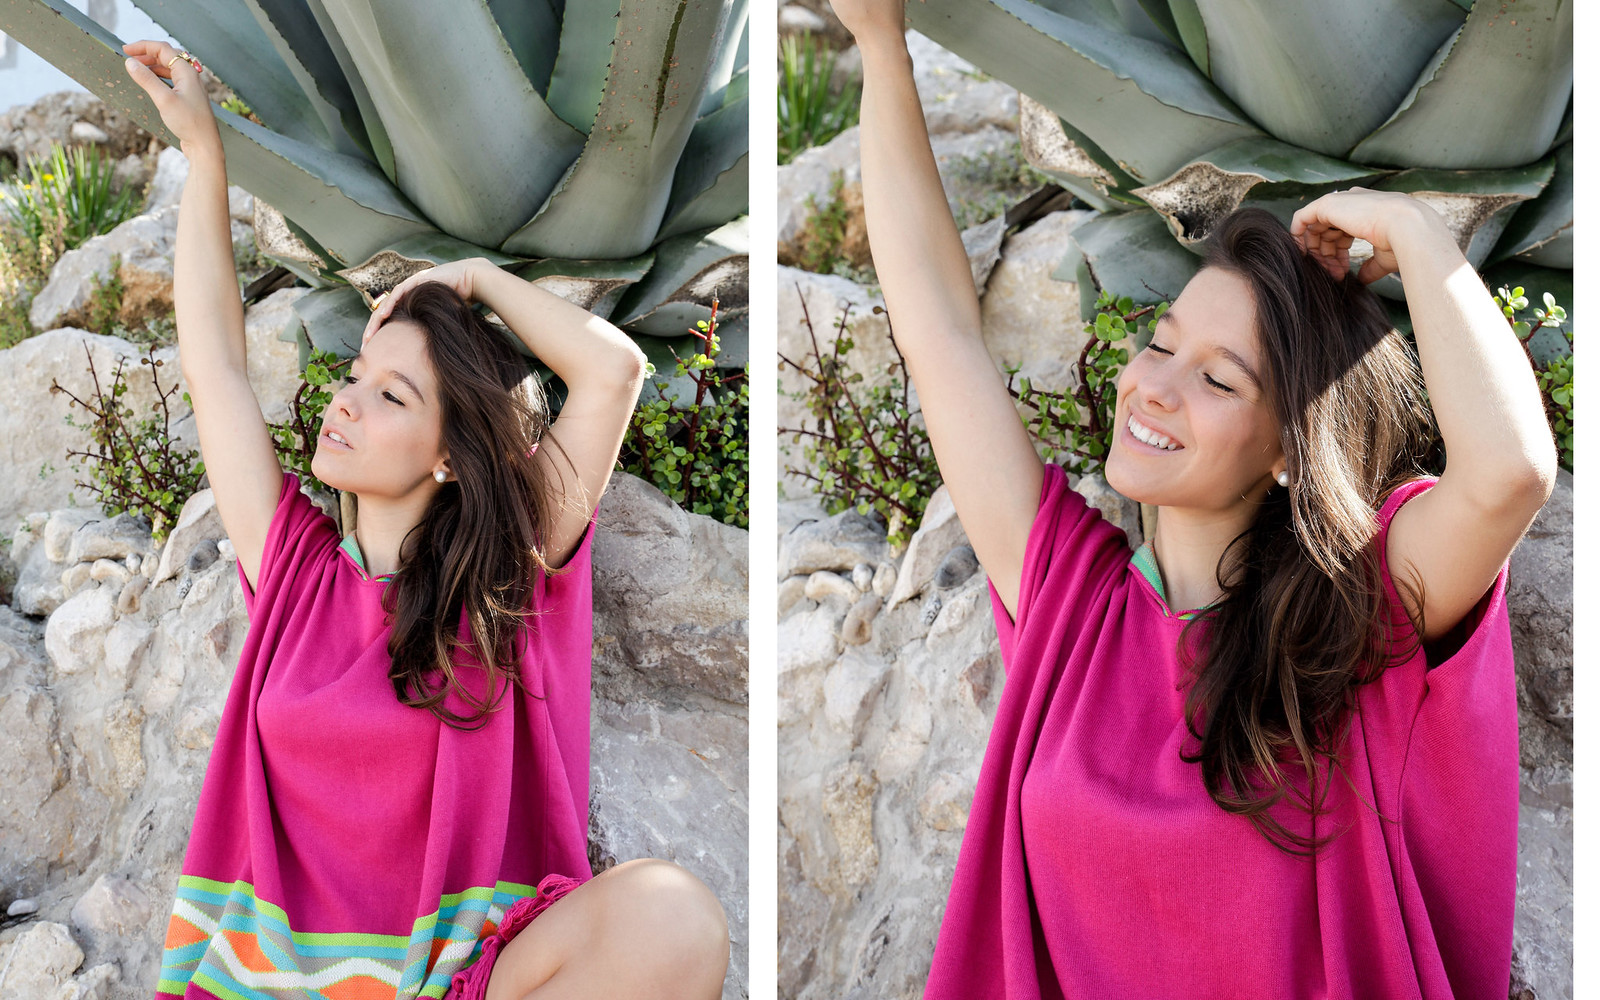 04_Poncho_rosa_RÜGA_Laura_Santolaria_Theguestgirl_Ambassador_influencer_barcelona